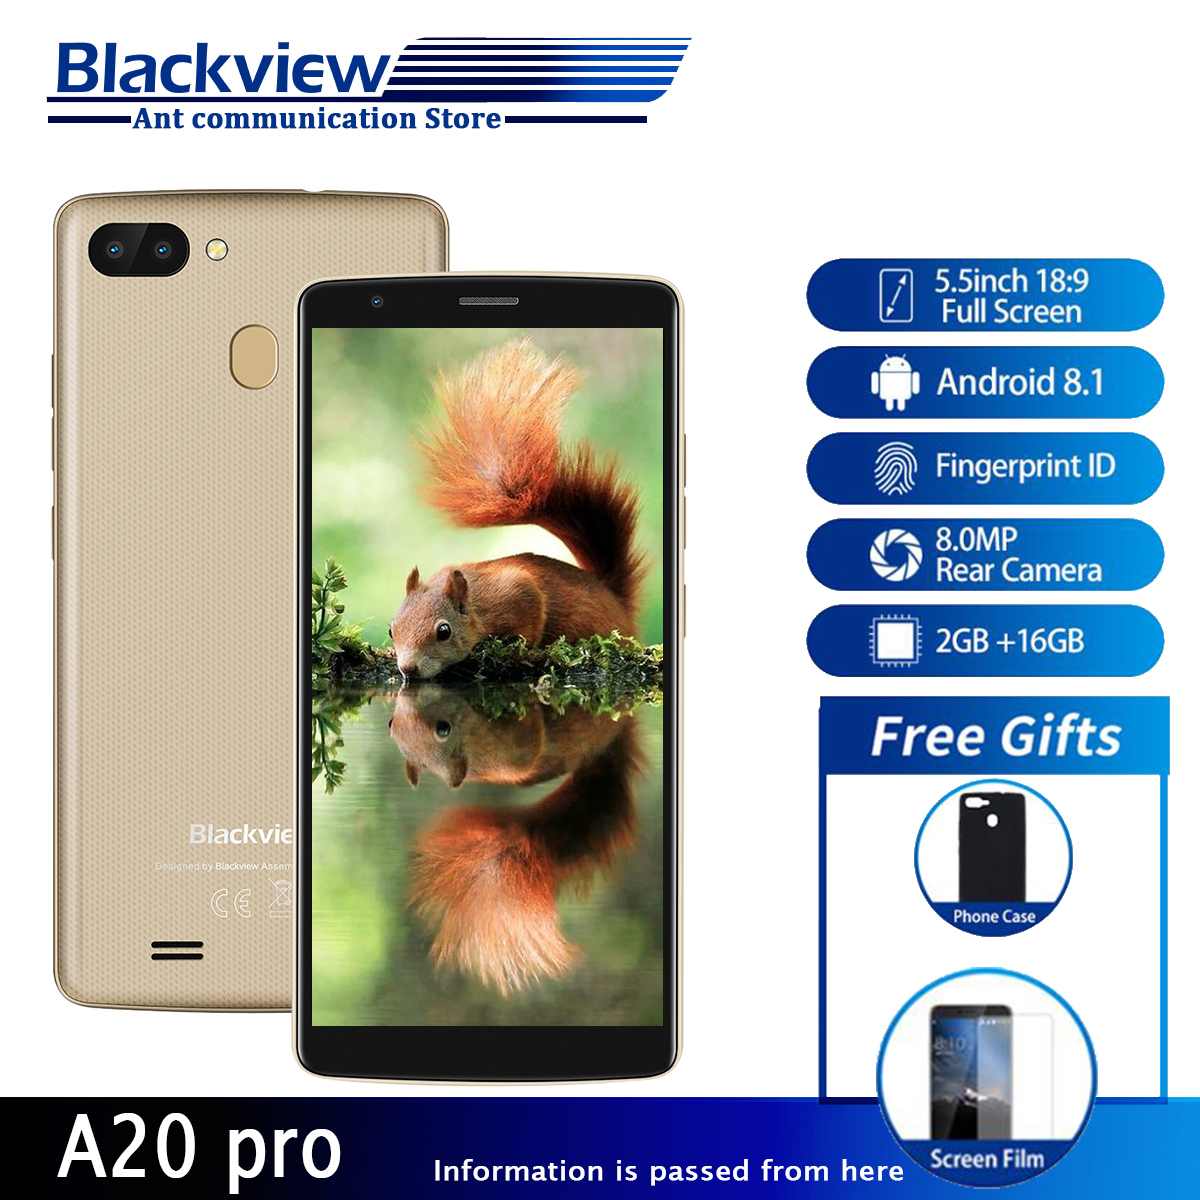 Новый смартфон Blackview A20 18:9 5,5 дюймовый экран Android Go двойная камера 1 Гб + 8 Гб 3000 мАч аккумулятор 3g мобильный телефон MT6739WAL